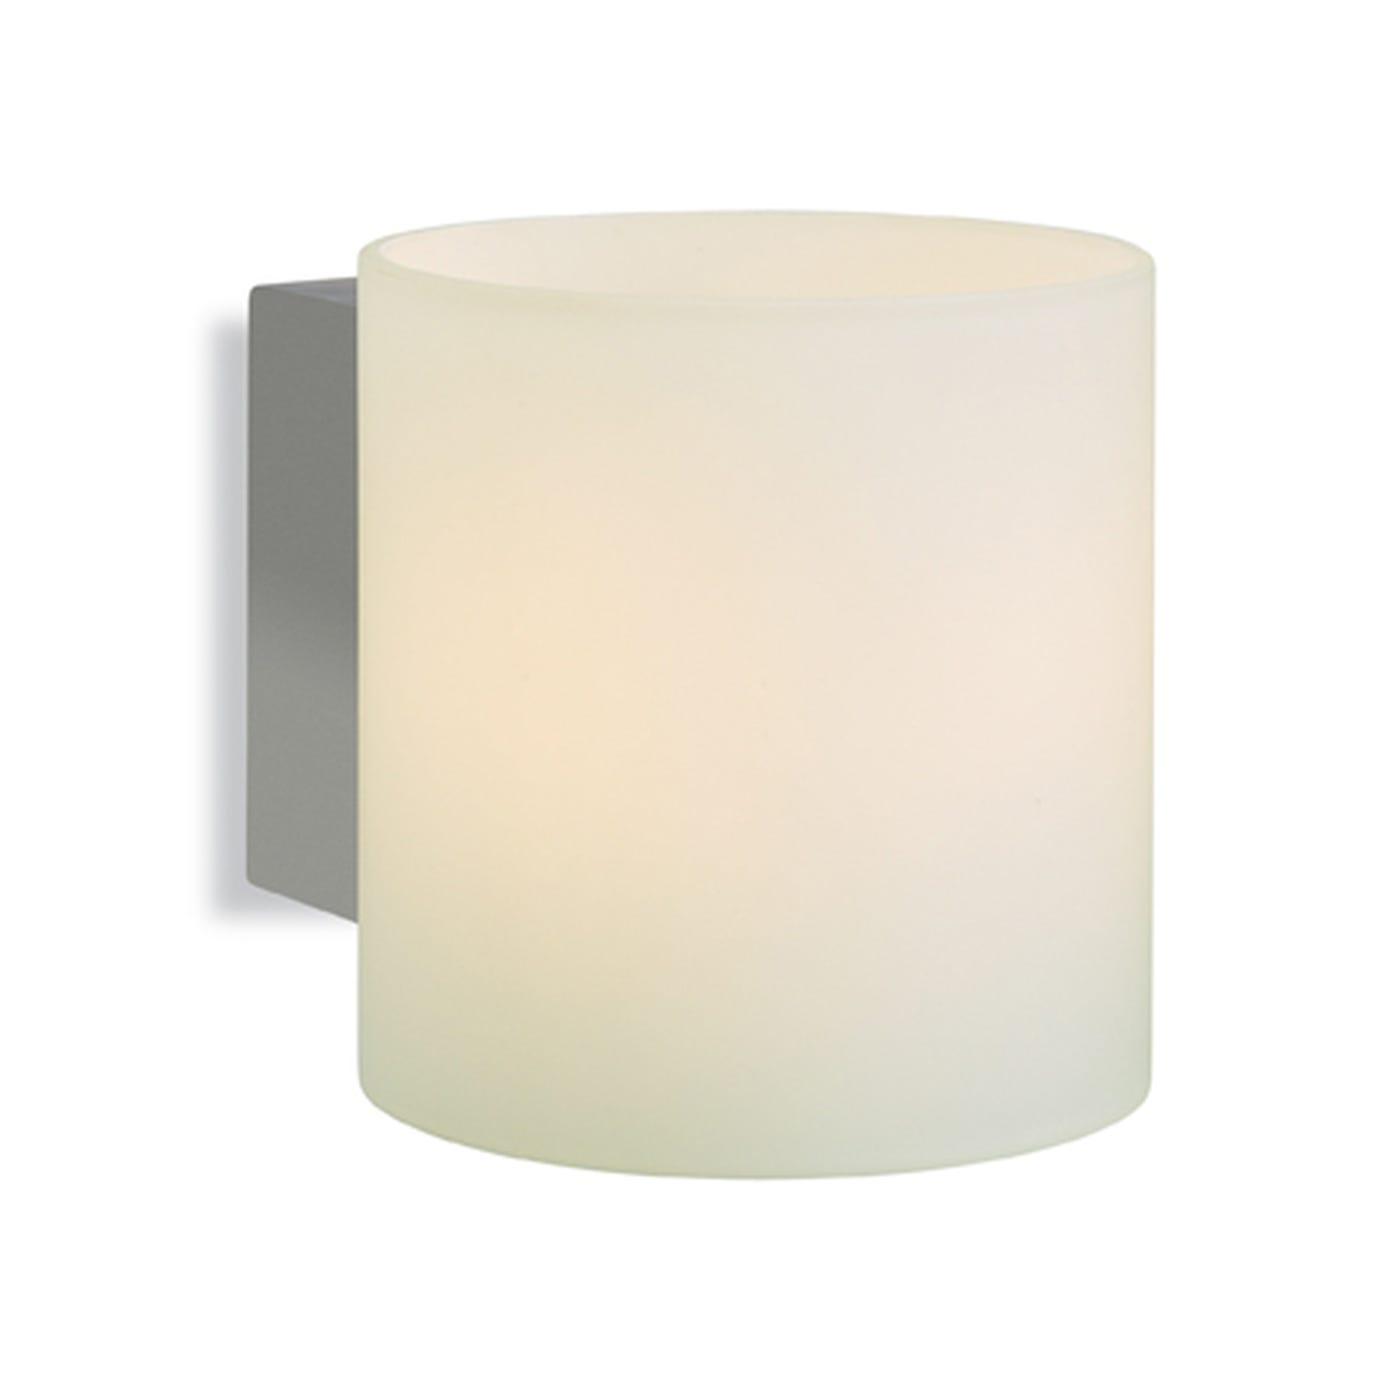 Alto Wall Light